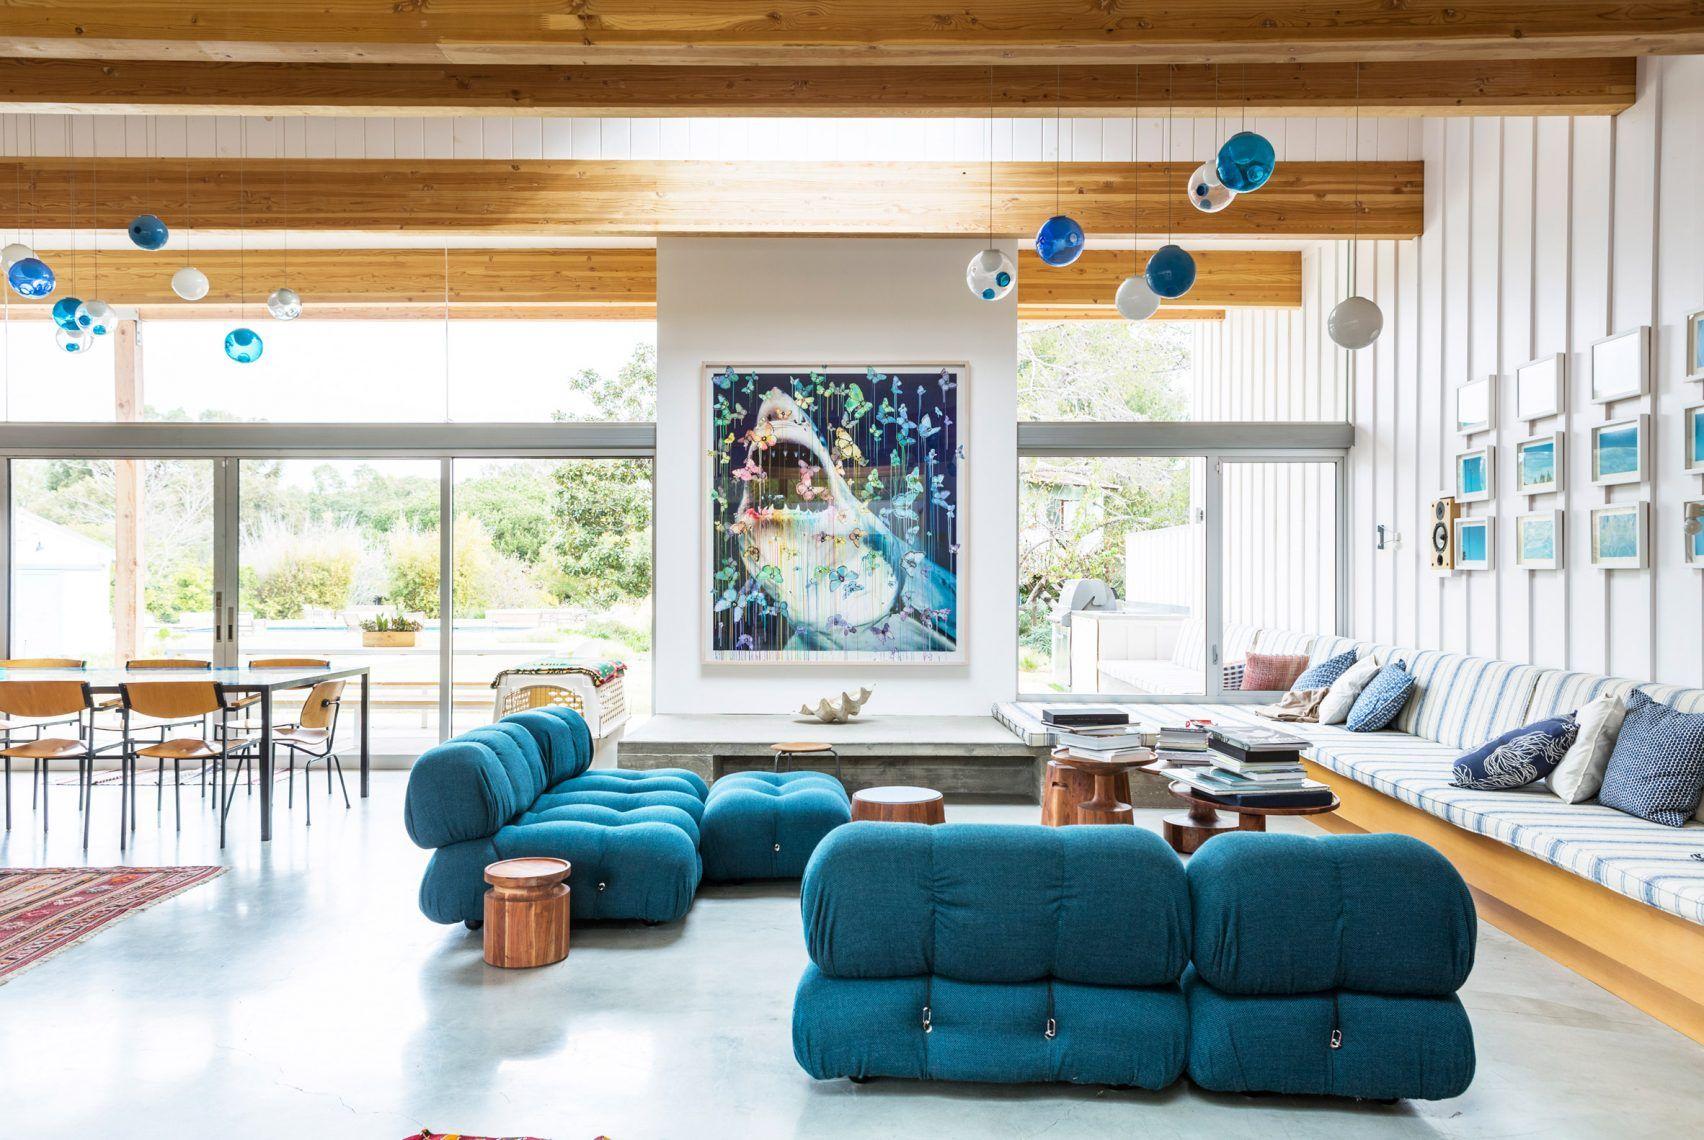 Photography laure joliet sweet home make interior decoration design ideas also rh pinterest